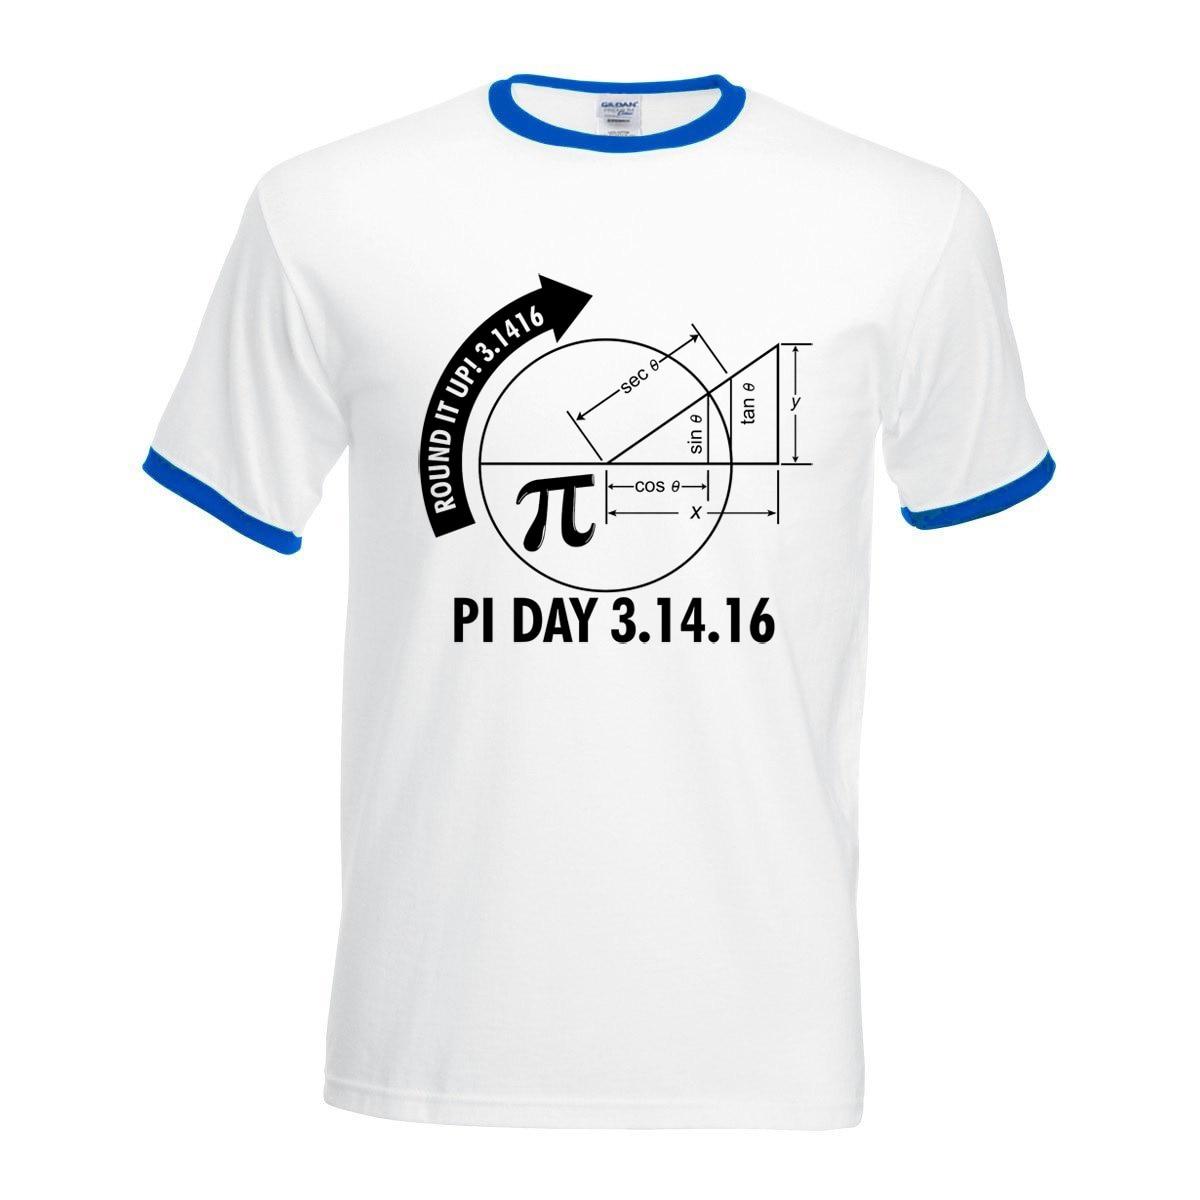 2017 new arrival contrast hit collar t-shirts Pi Day 3.1416 Round It Up camisetas men harajuku short sleeve Math Graph tops tees